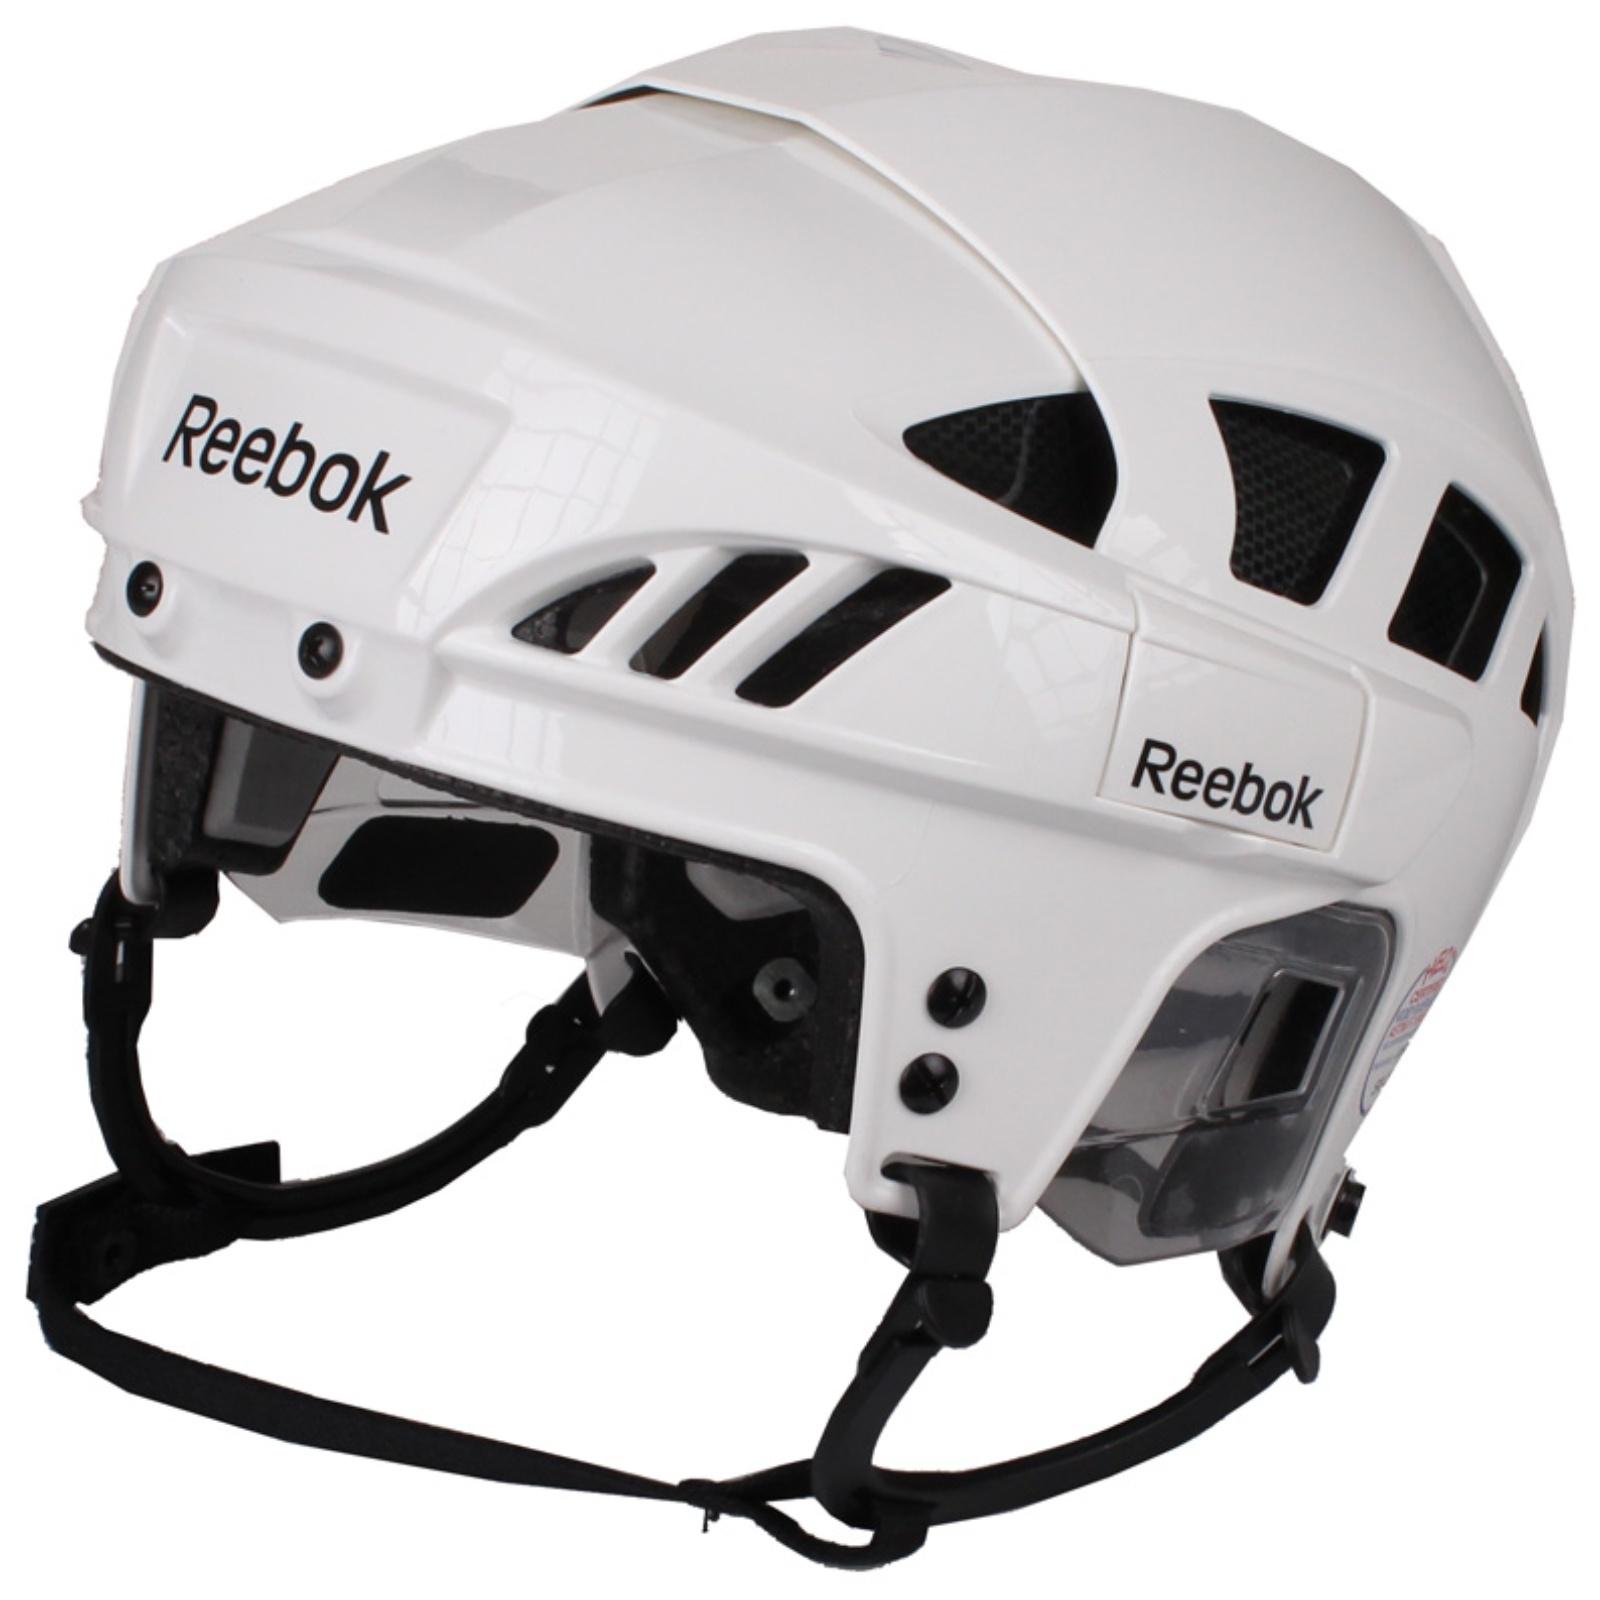 Hokejová helma REEBOK 7K bílá - vel. S